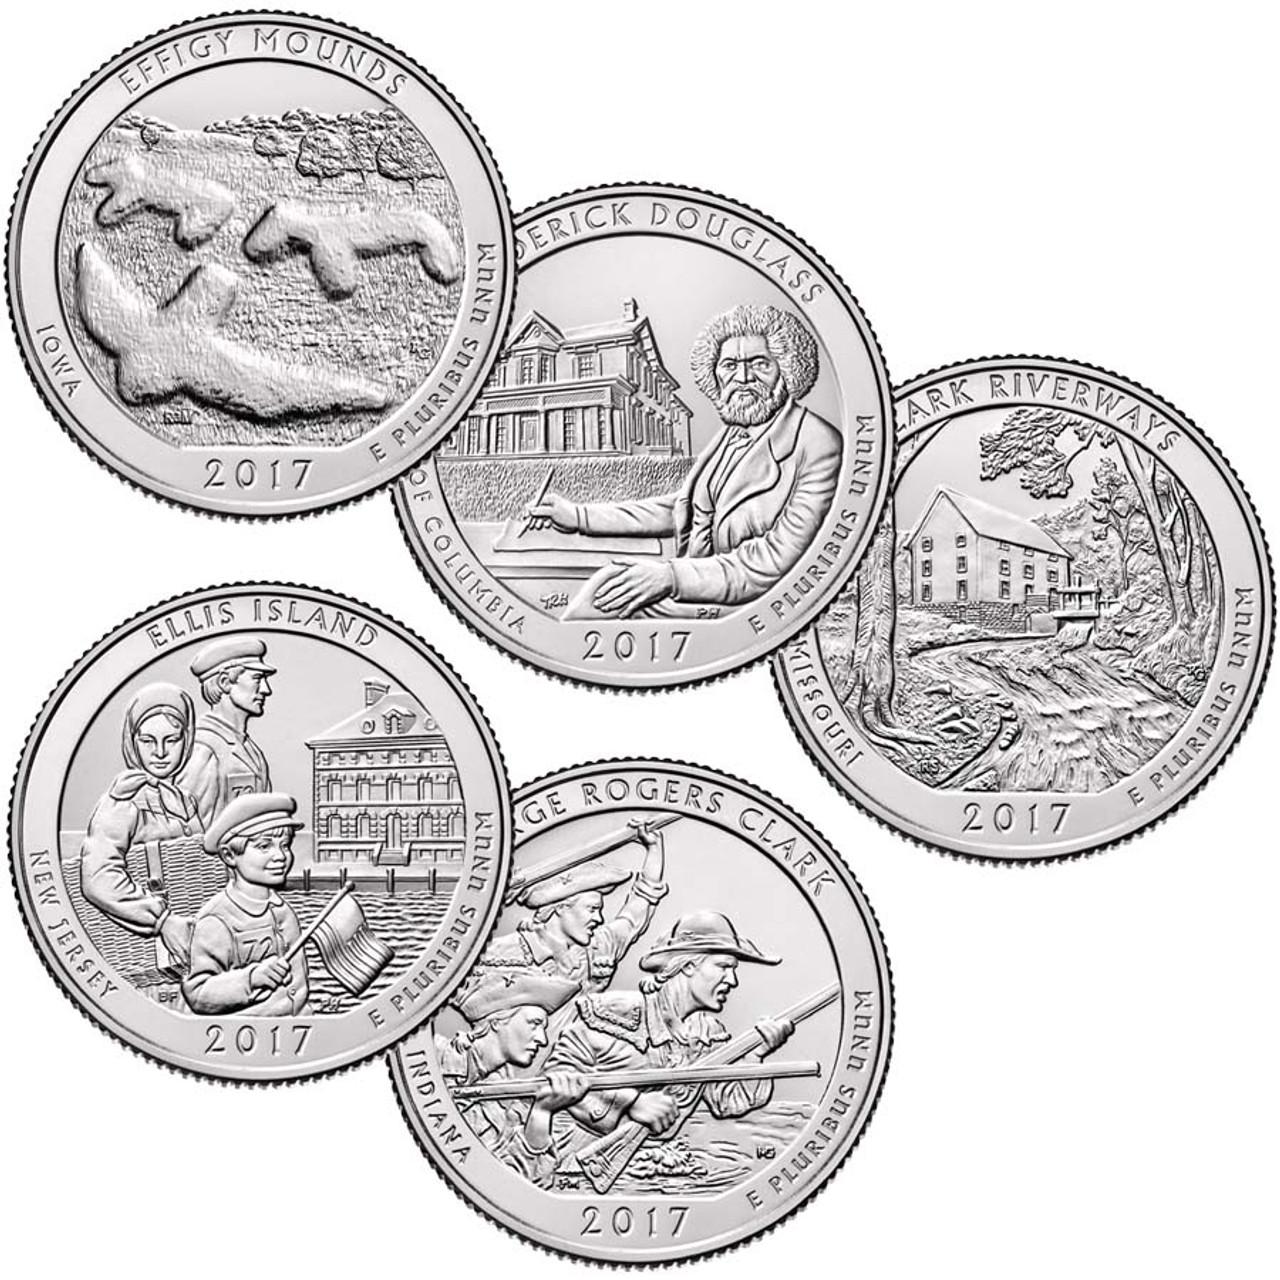 2017 National Parks Quarter 5-Coin Set, Brilliant Uncirculated